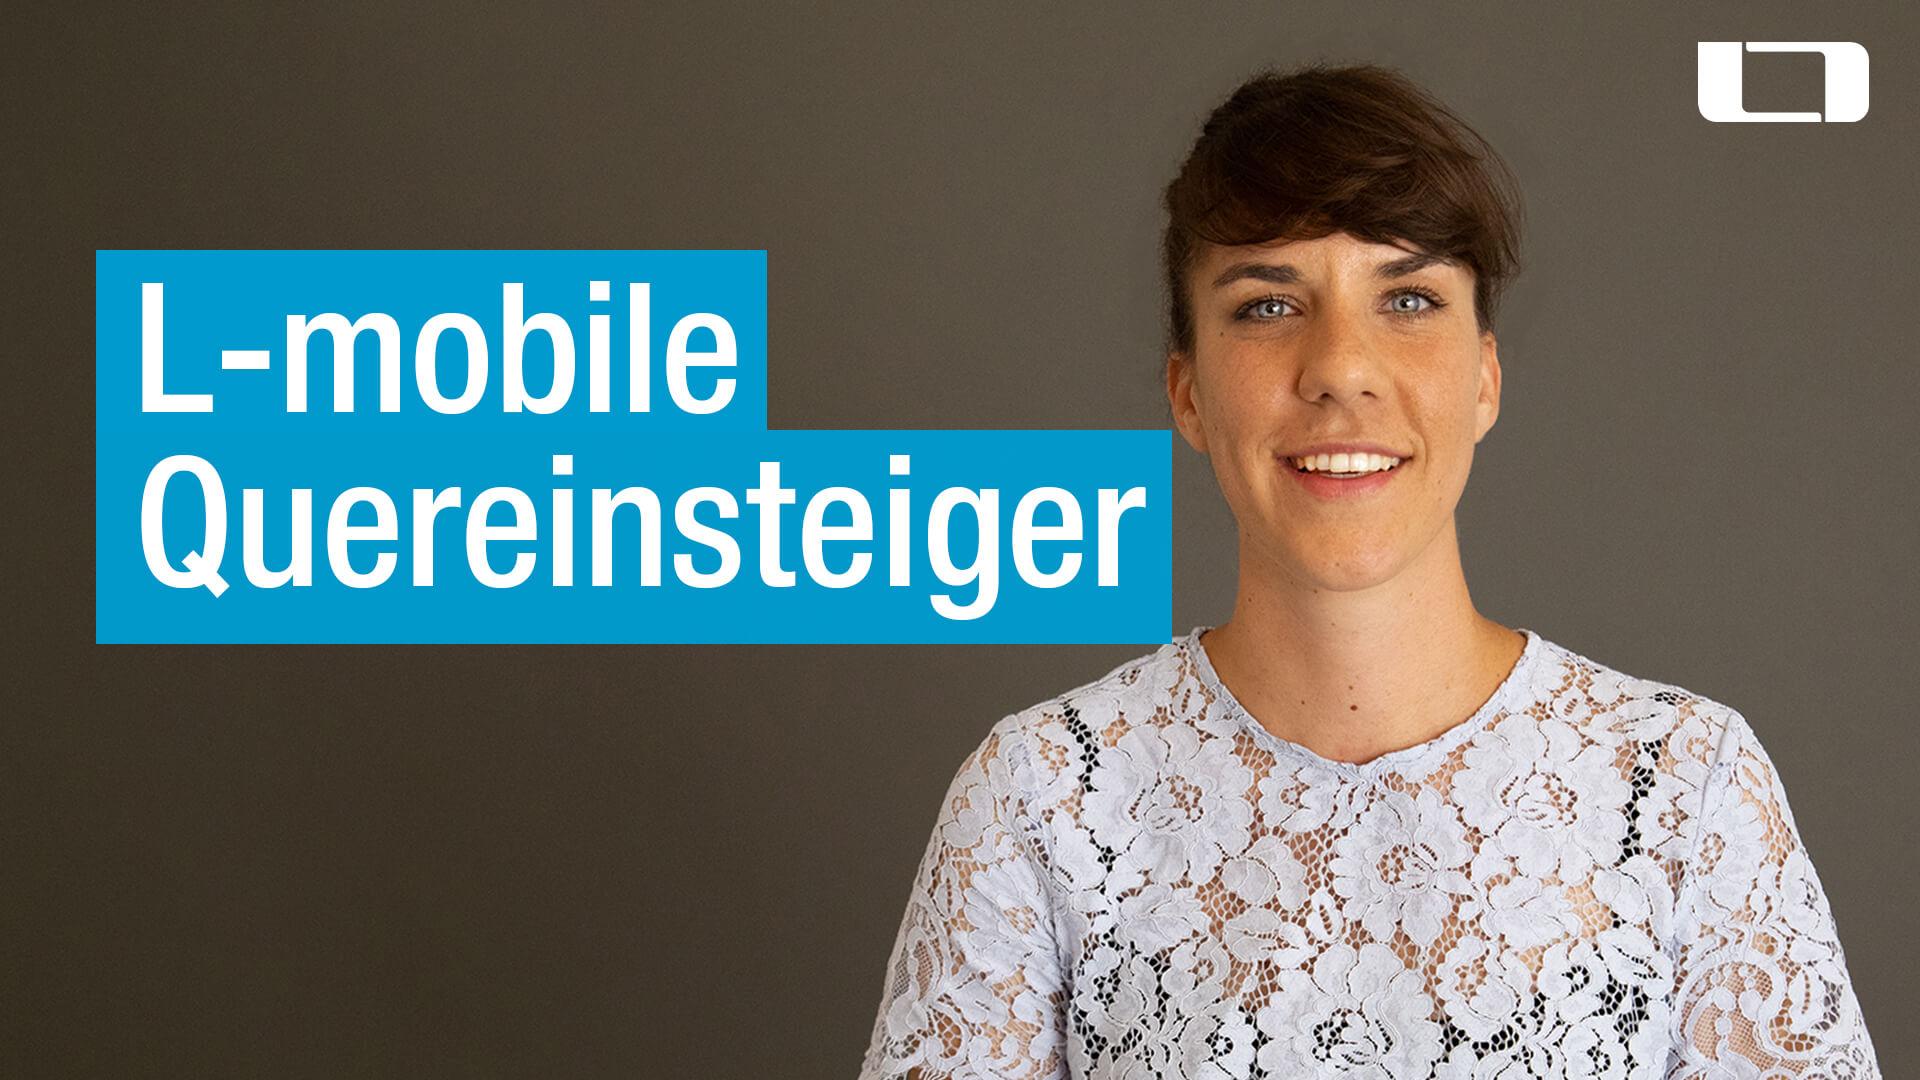 L-mobile_Videogalerie_Quereinsteiger_Bea